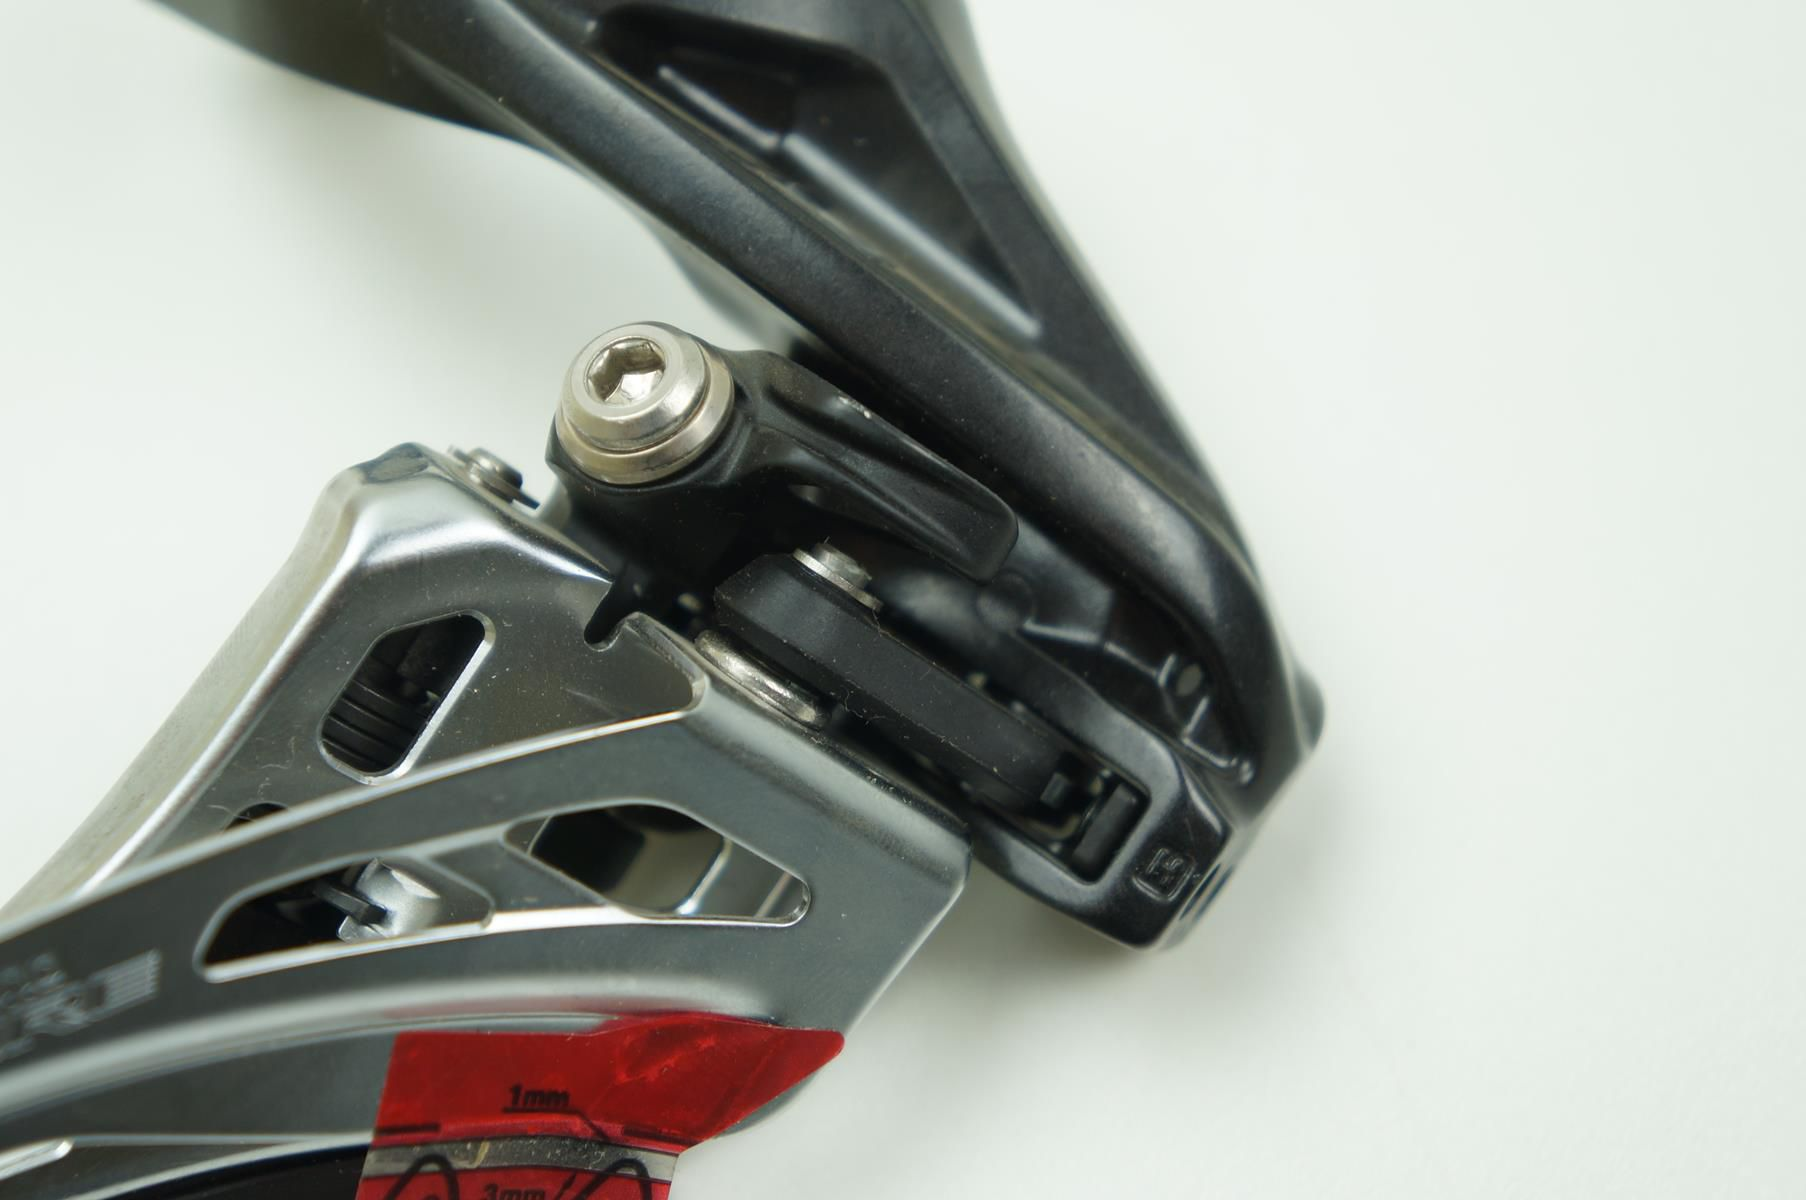 Cambio Dianteiro Shimano Deore M6020 2x10 Side Swing 34.9mm 10 velocidades